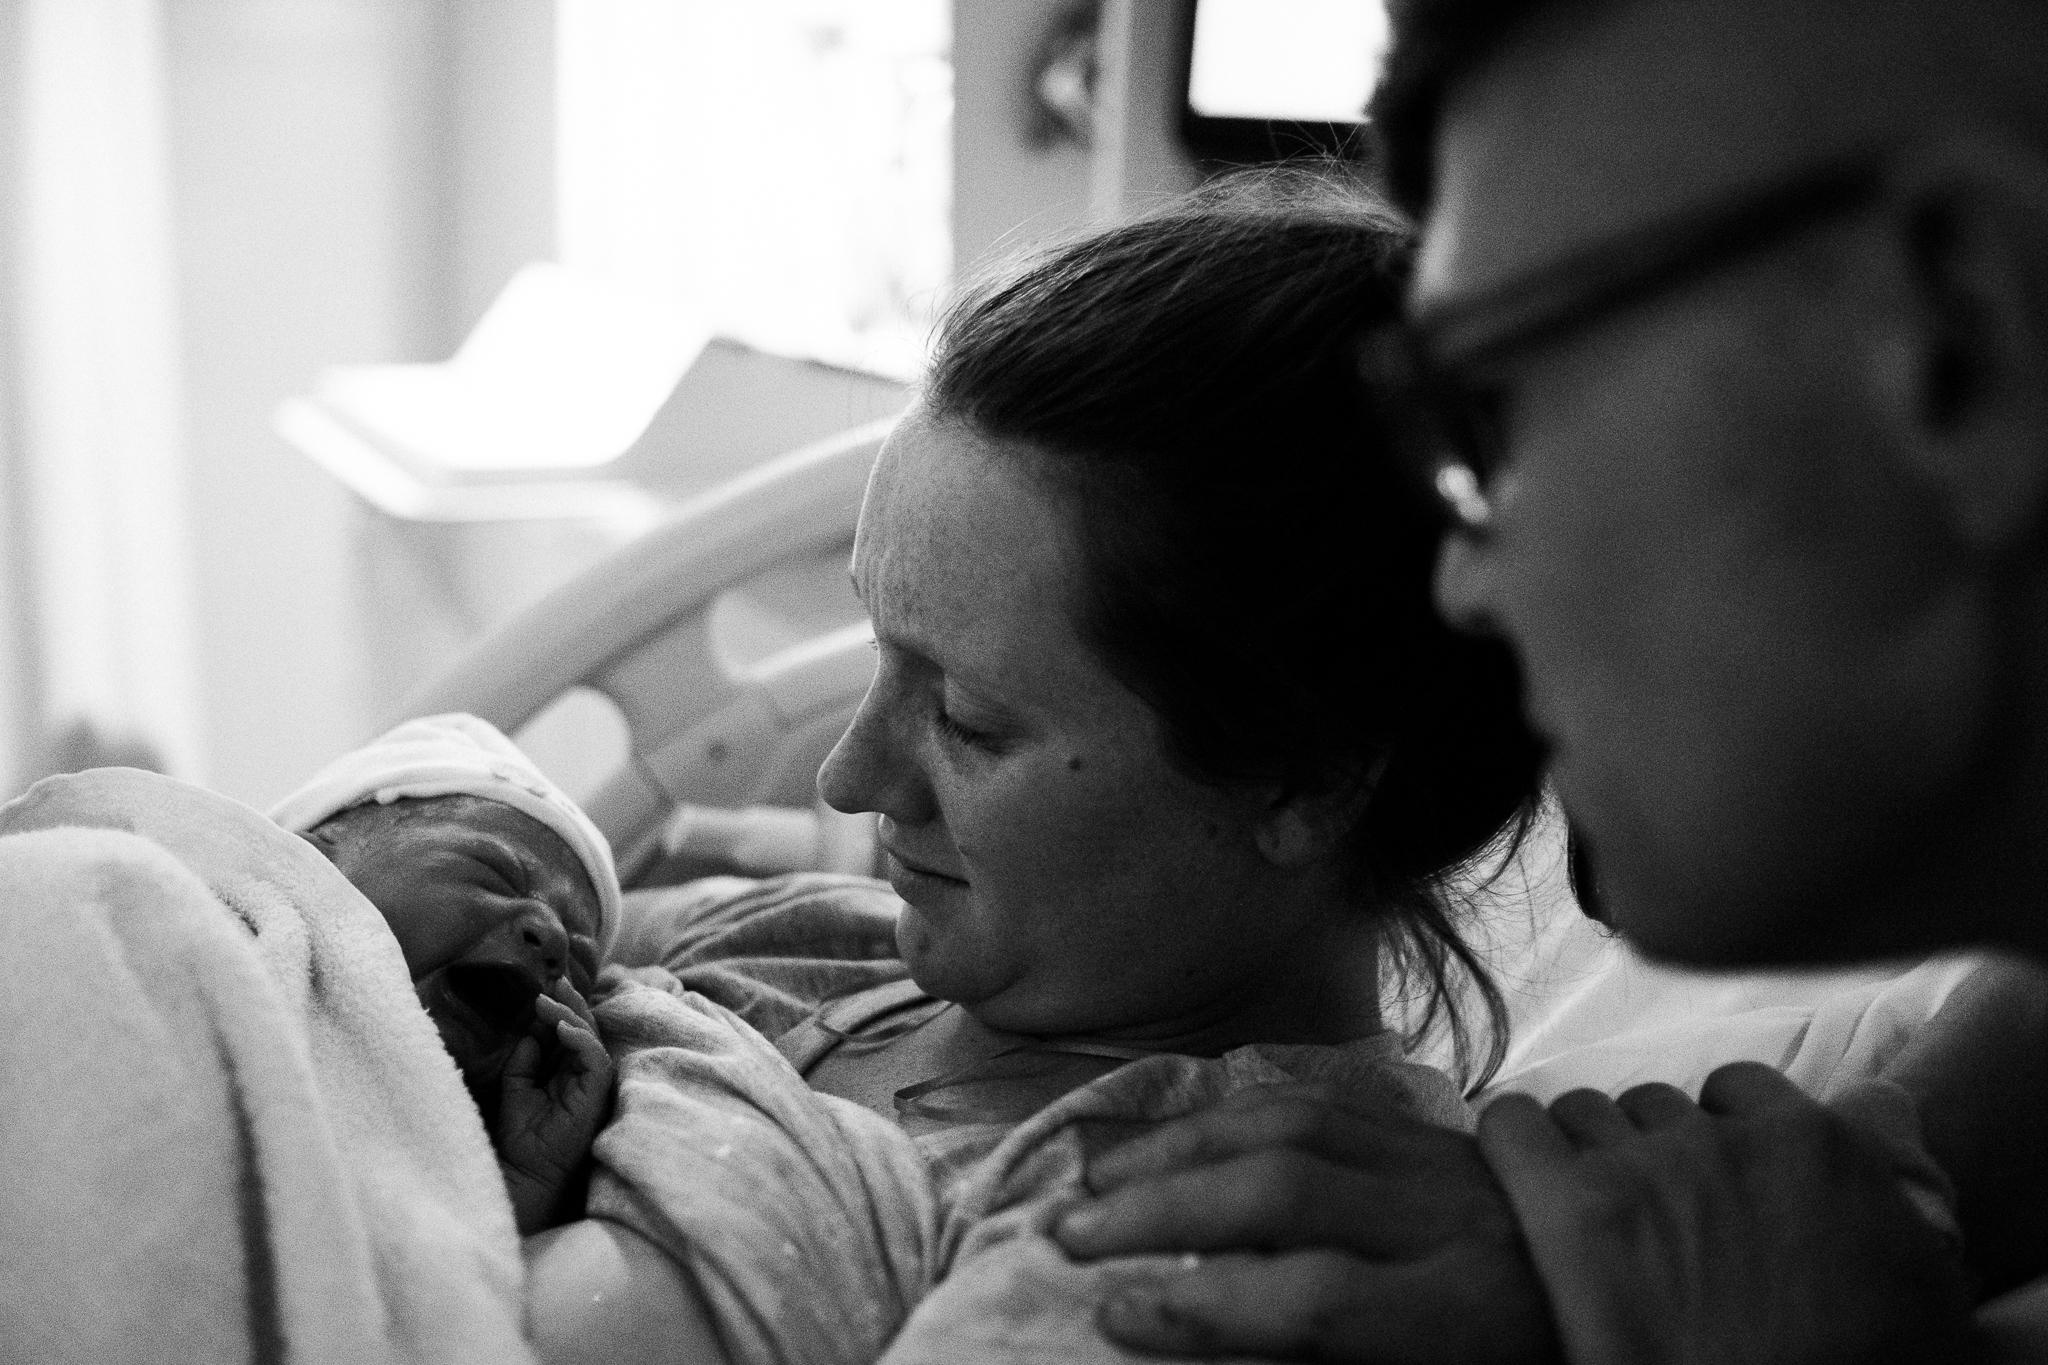 Birth Photographer Documentary Photography Newborn Baby Hospital Family - Jenny Harper-12.jpg